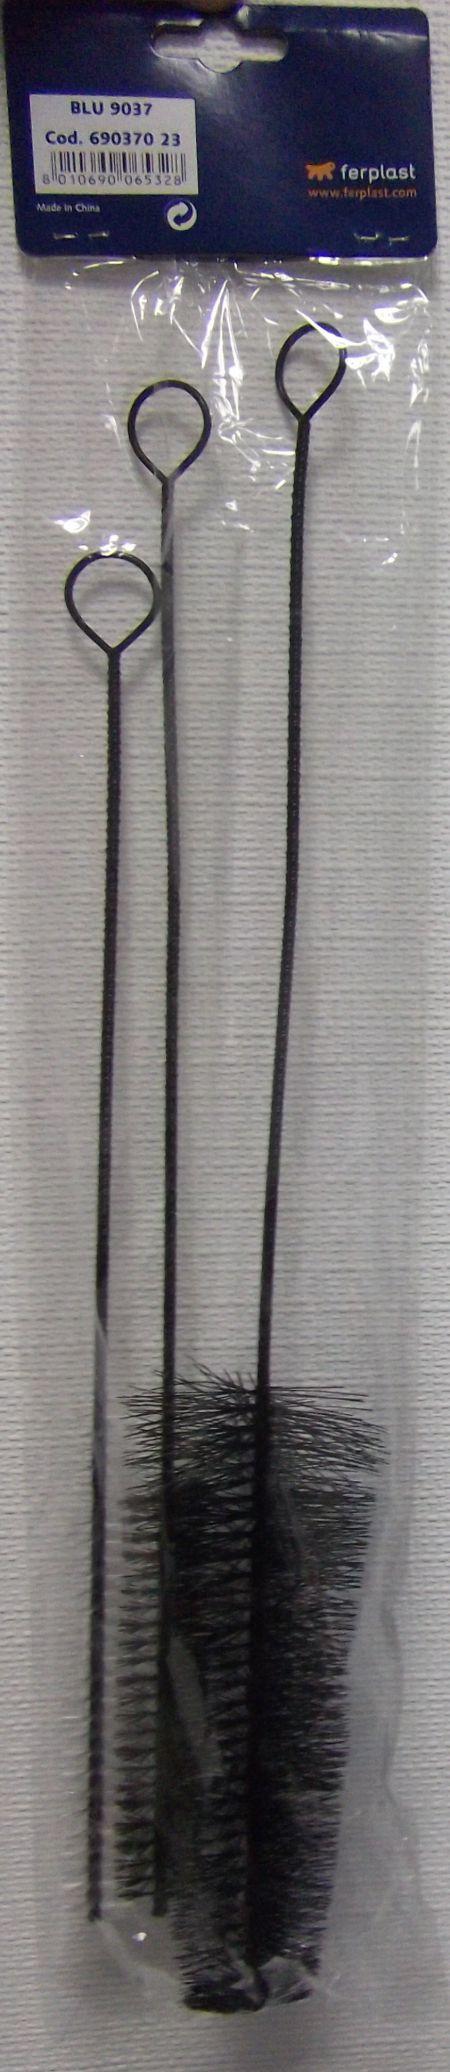 Ferplast BLU 9037 набор ершиков  для чистки трубок и шлангов